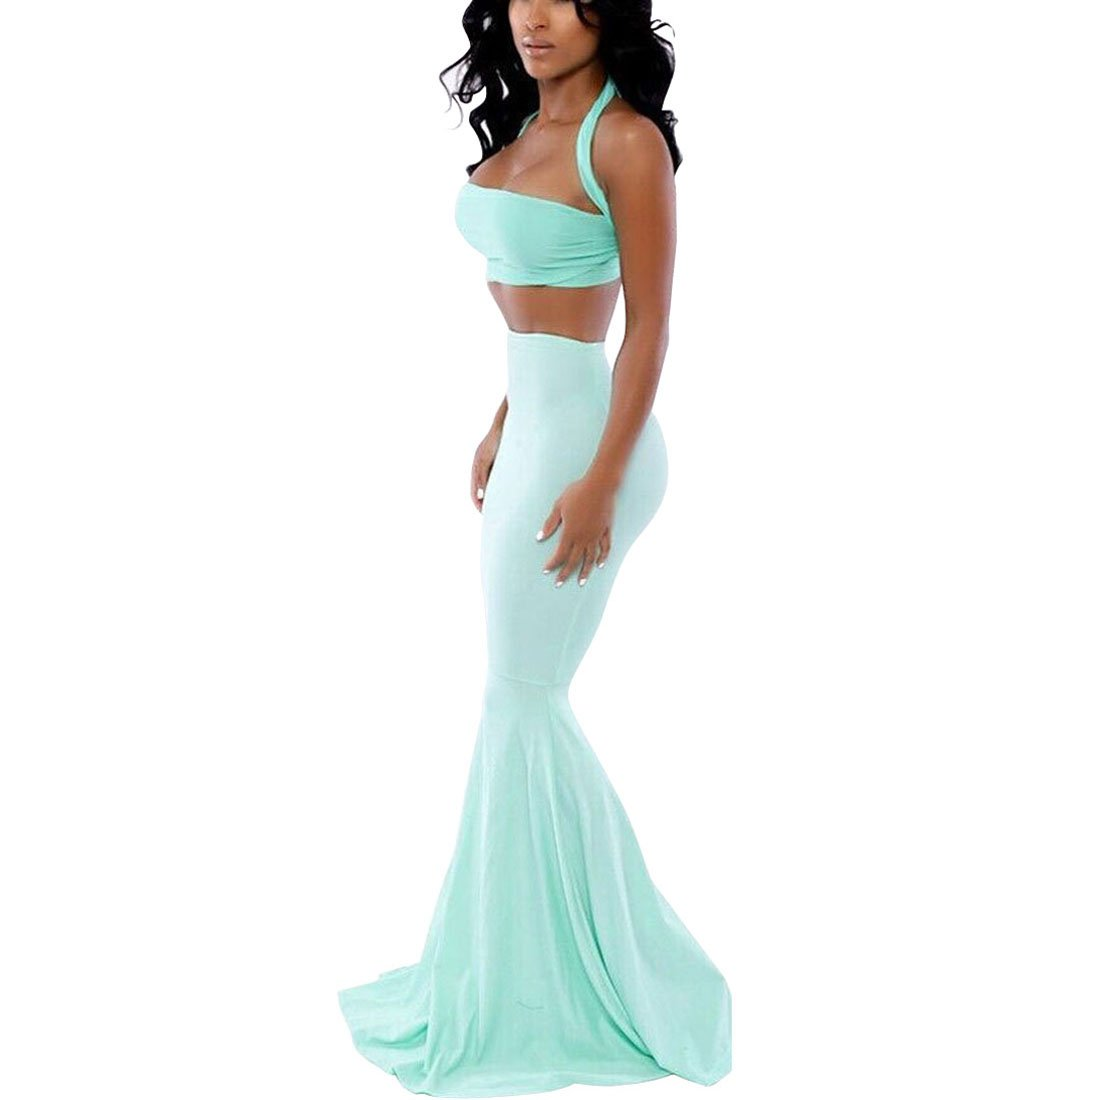 Women Halter Crop Top with Mermaid Maxi Skirt,mint green,L,OP53994